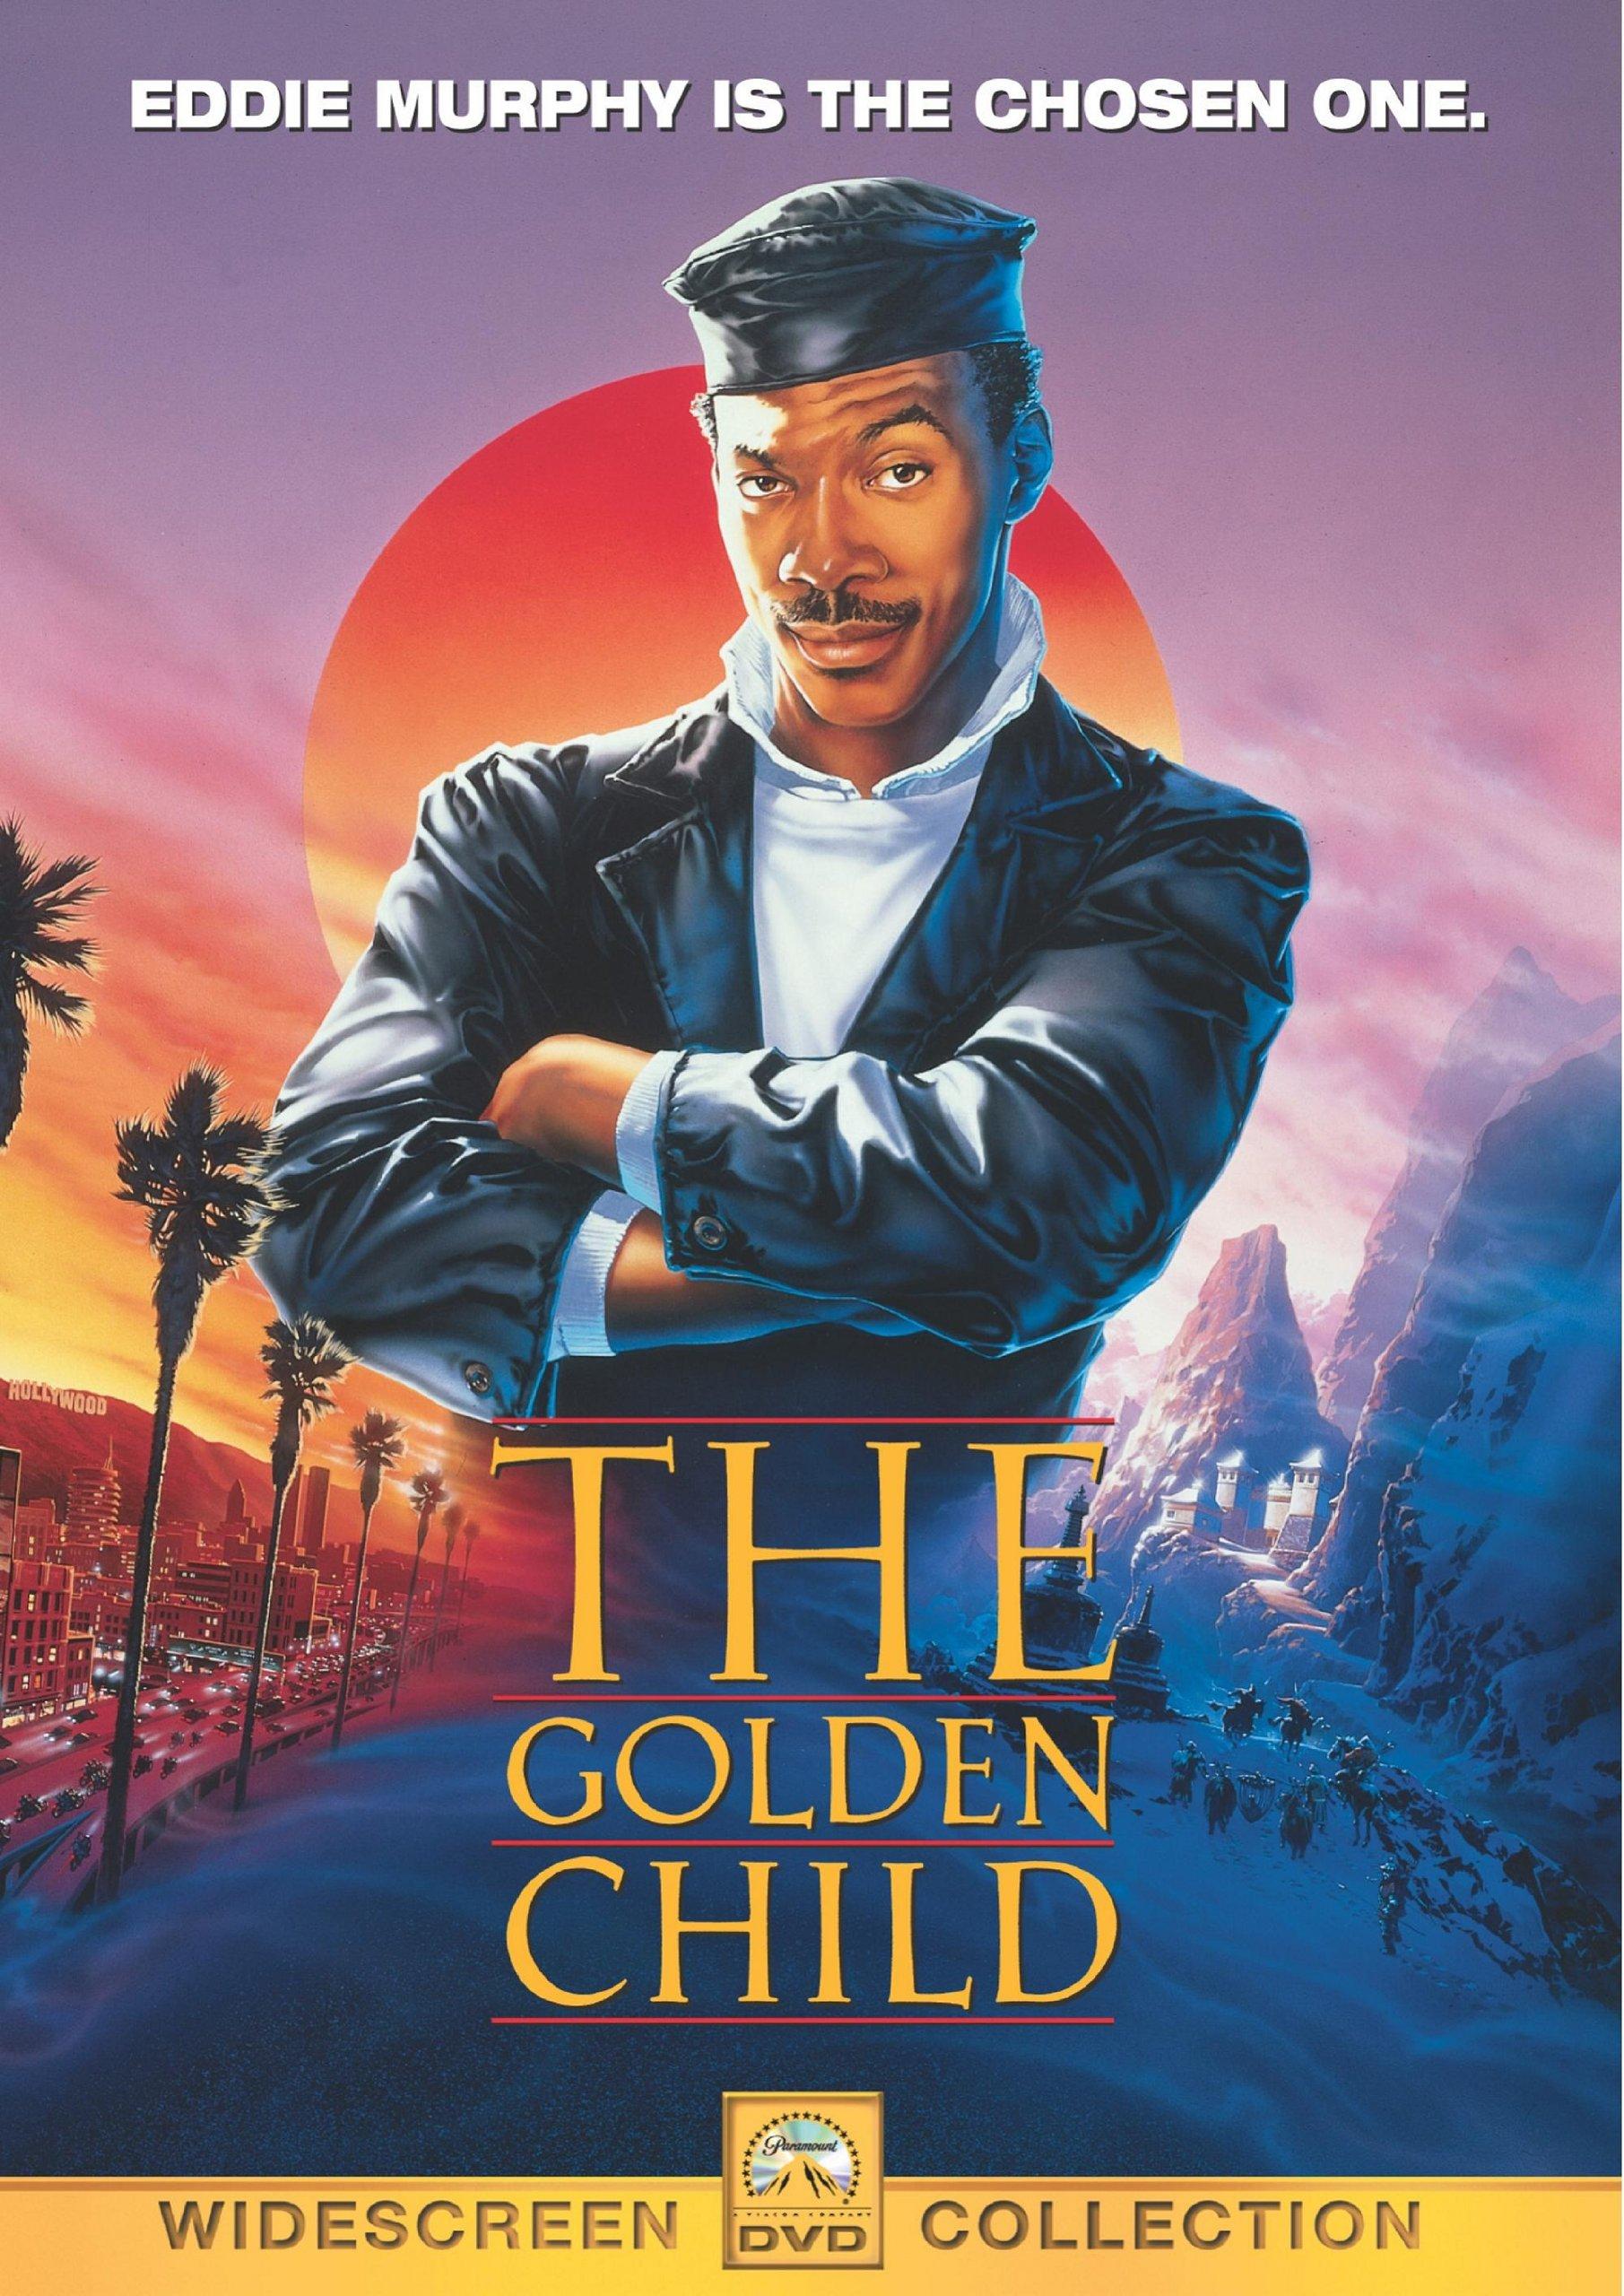 Golden Child, The (1986)